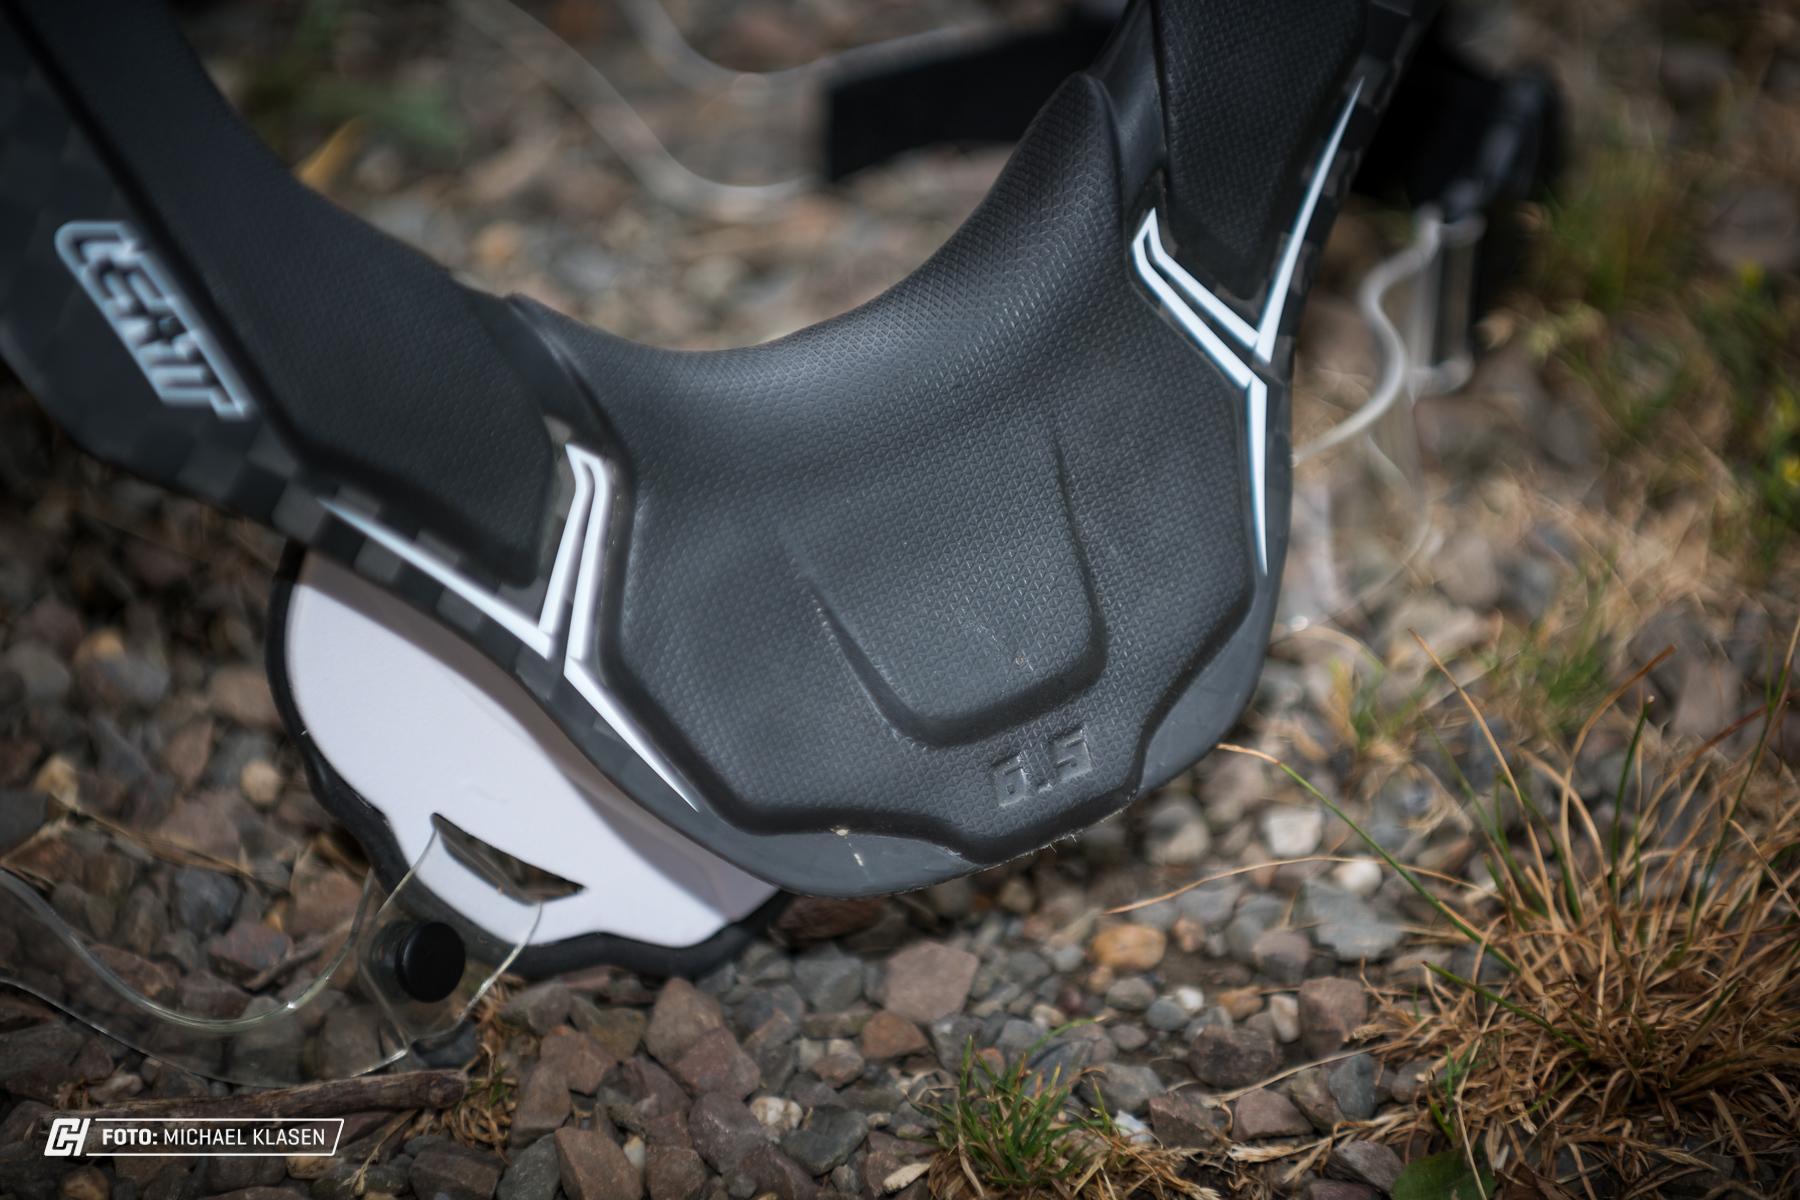 MIK 0268 Cycleholix